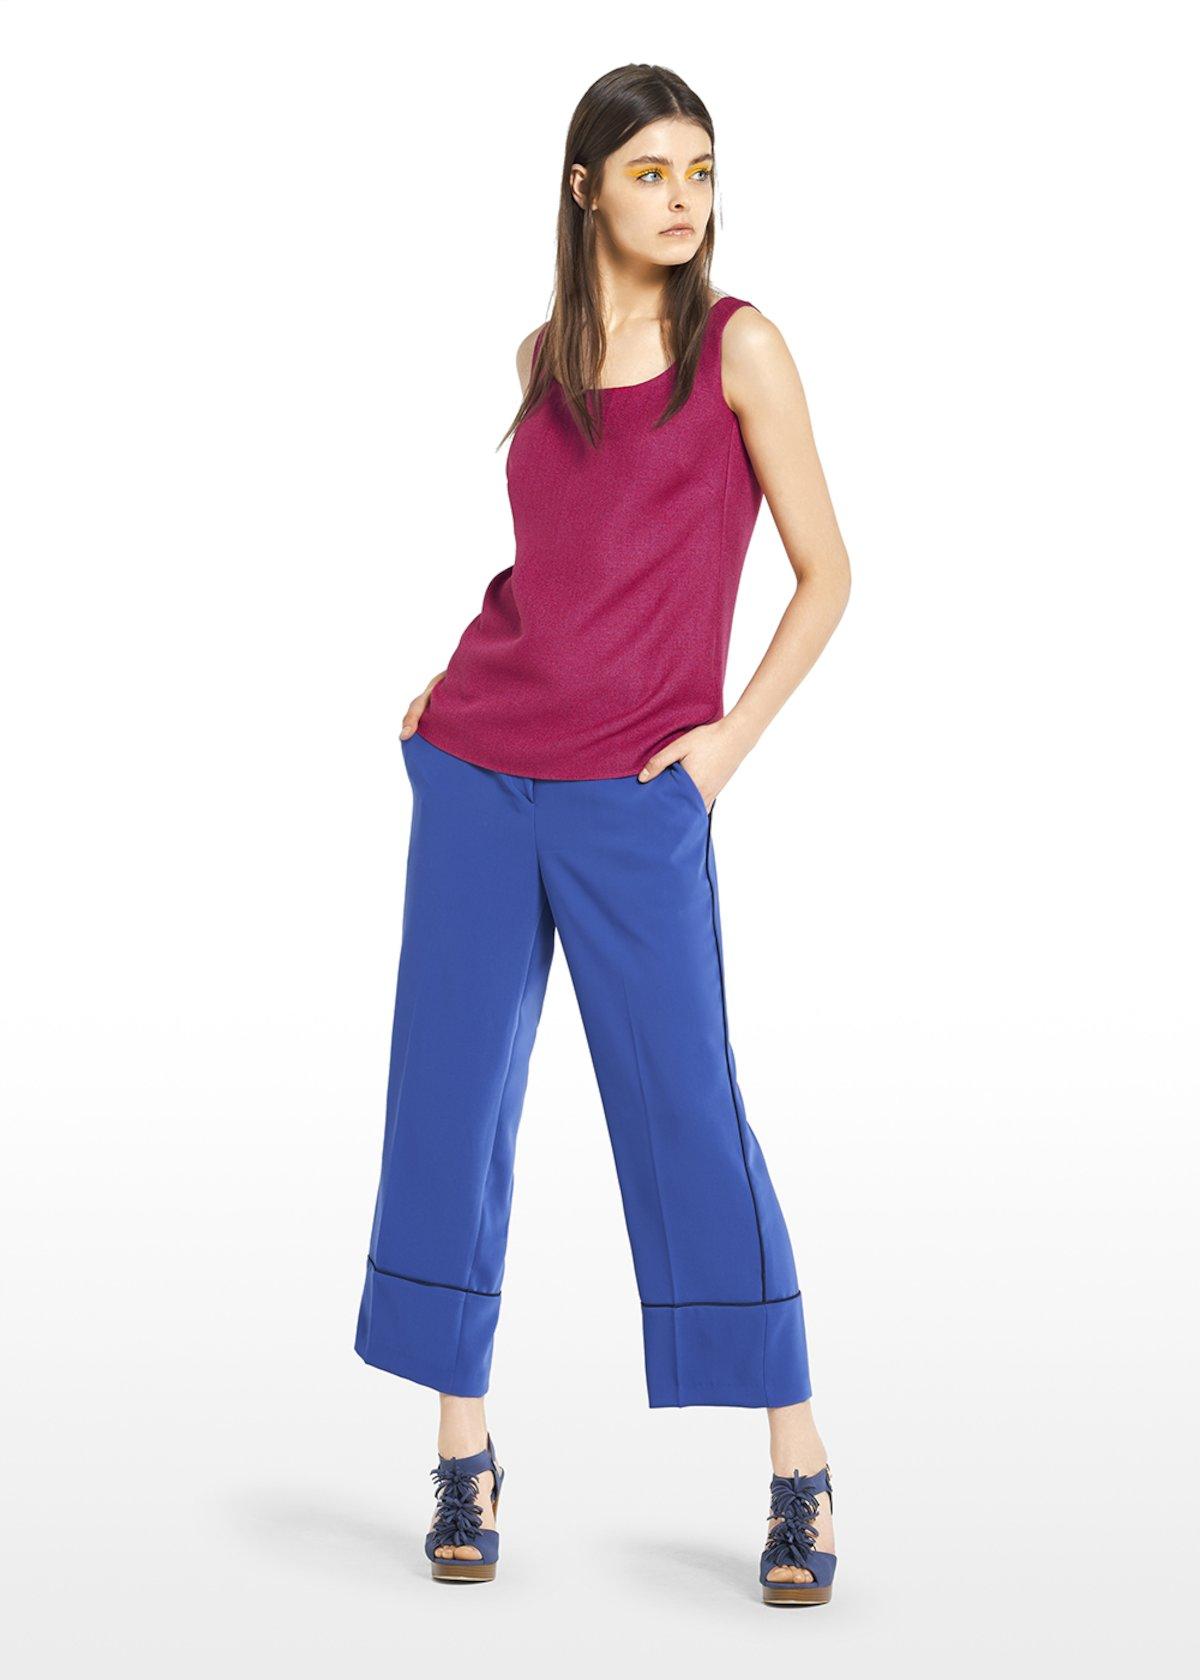 Top Trudie in mat effect fabric - Peonia - Woman